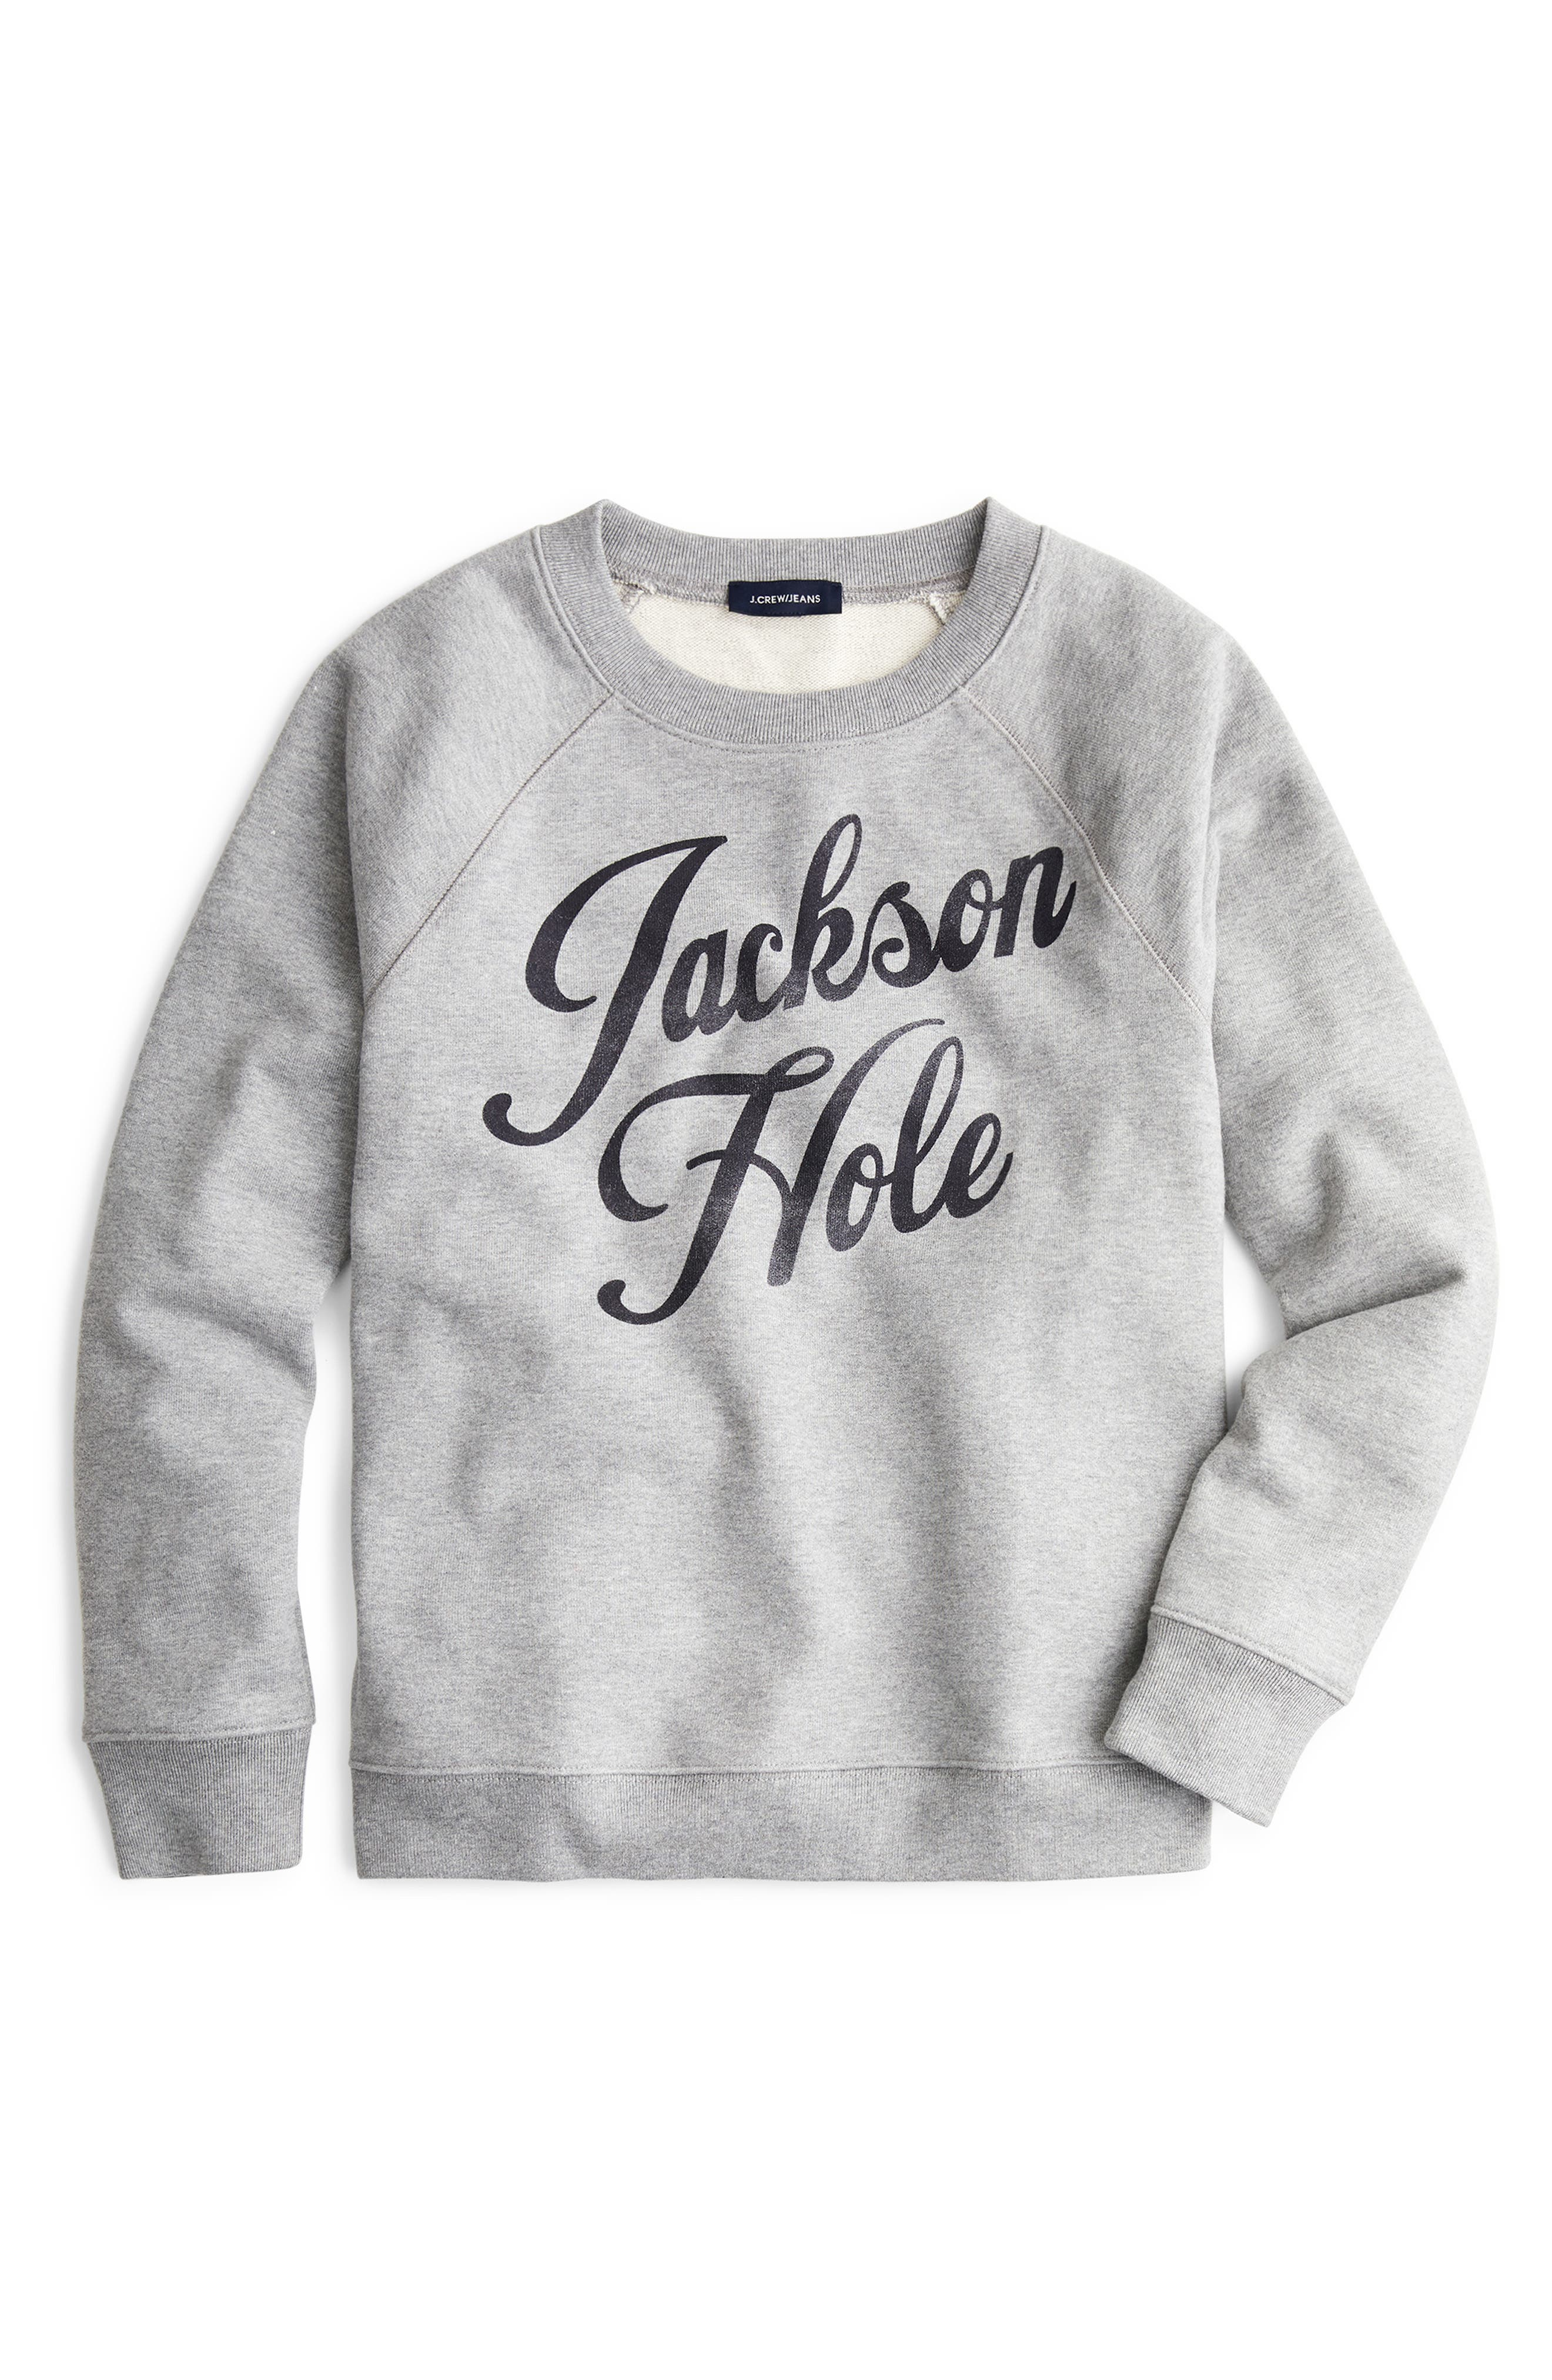 Jackson Hole Sweatshirt,                         Main,                         color, HTHR. SILVER